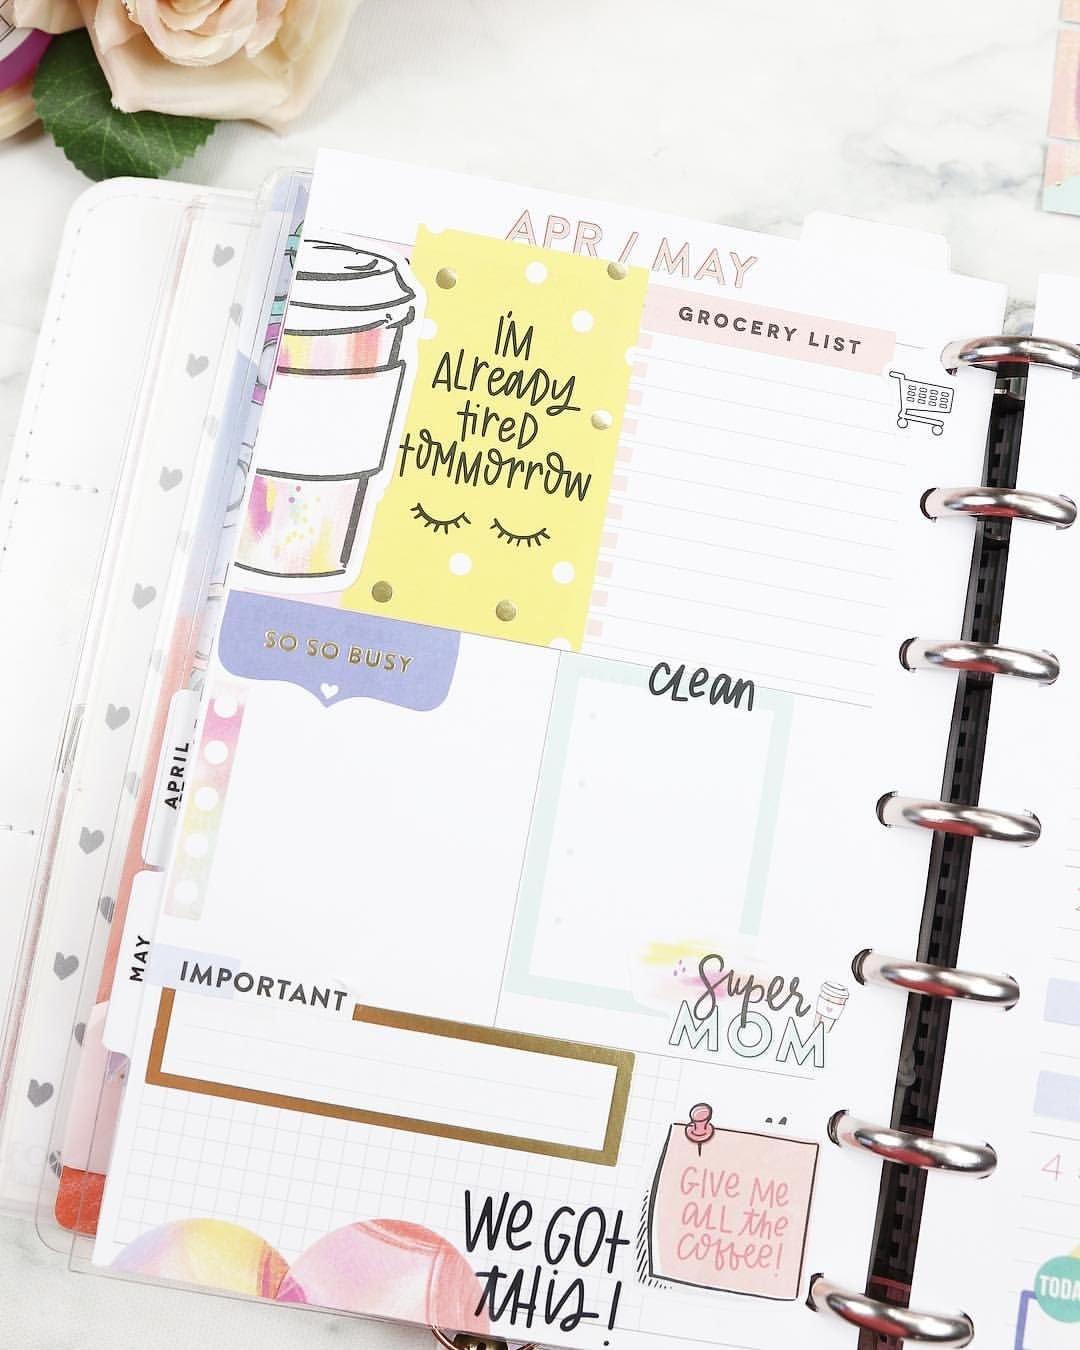 Pin On Plan Yo' Life. Templates Calendar For The Next 2 Weeks